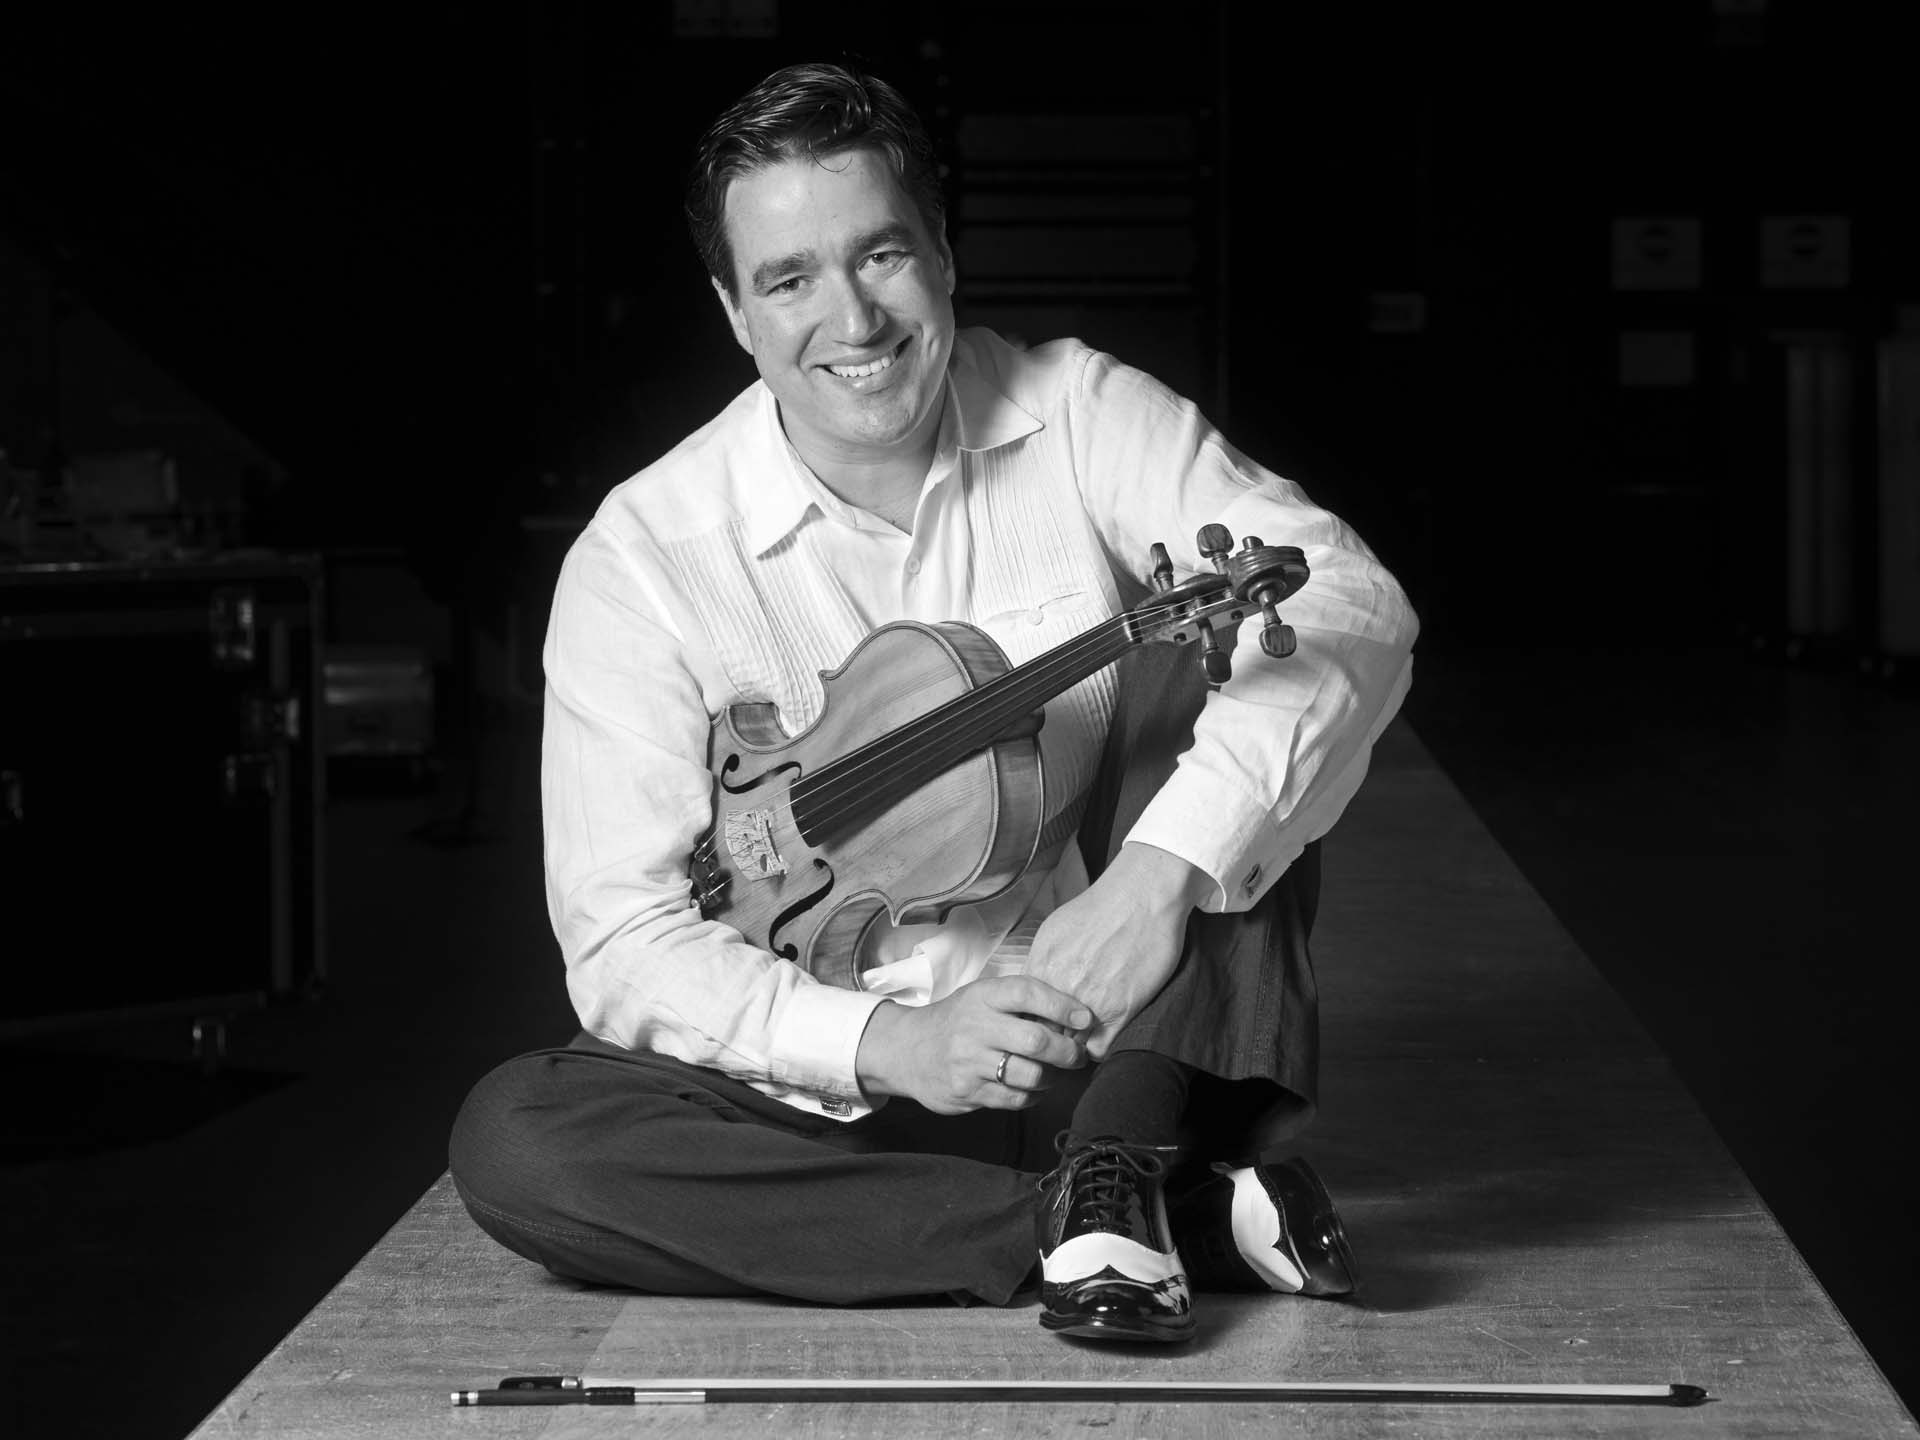 Raymond Arteaga Morales